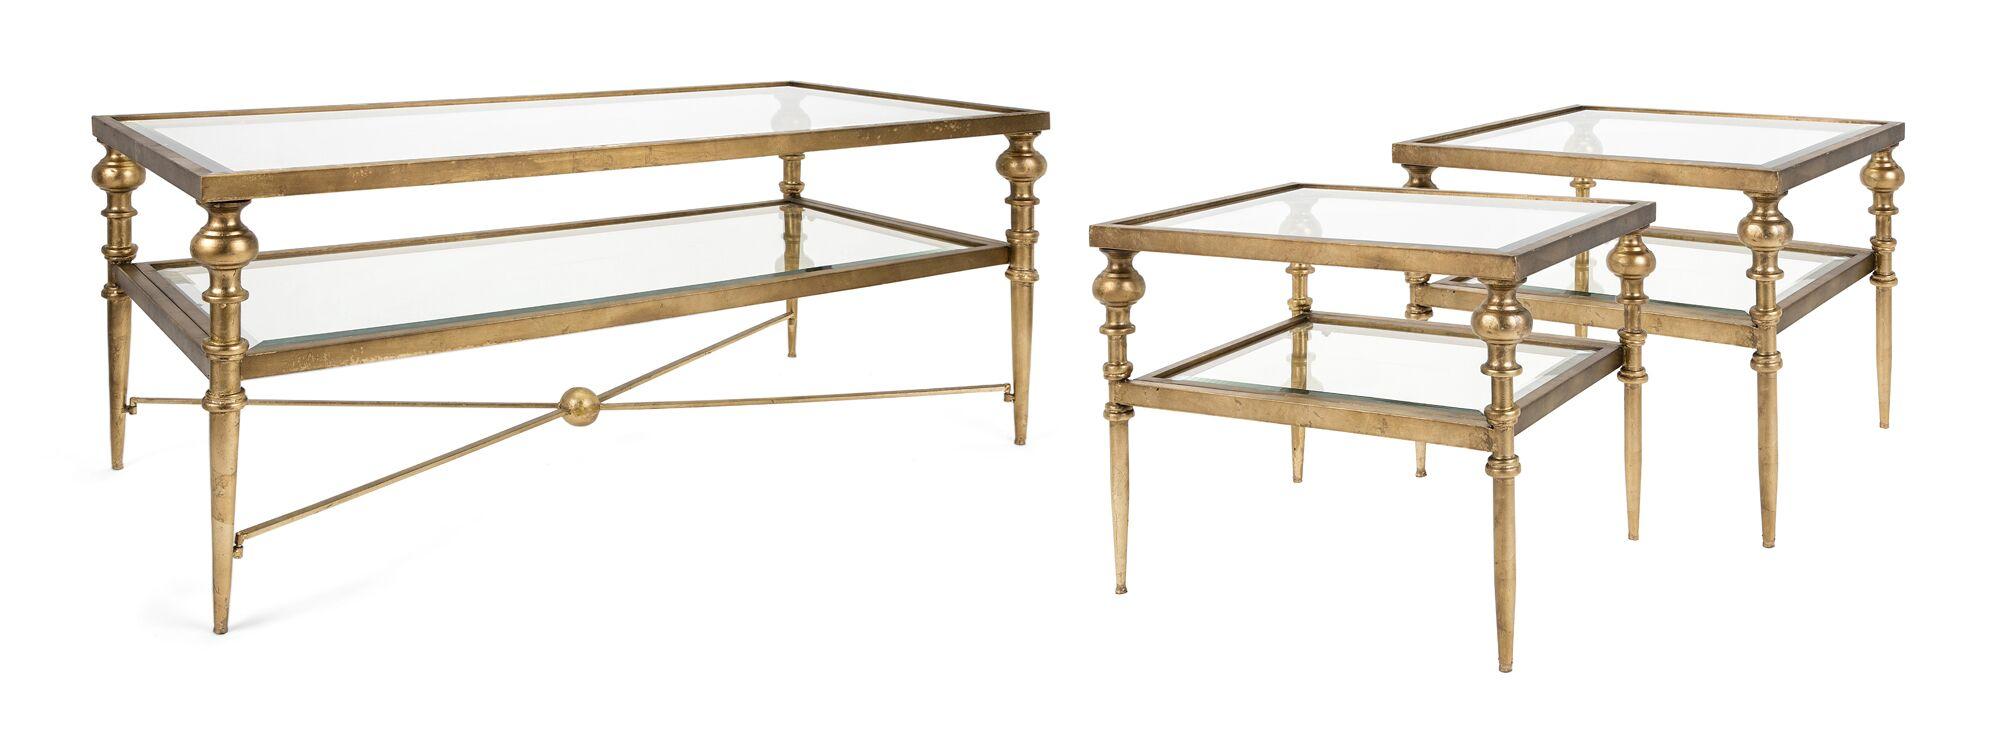 Lorenzen End Table